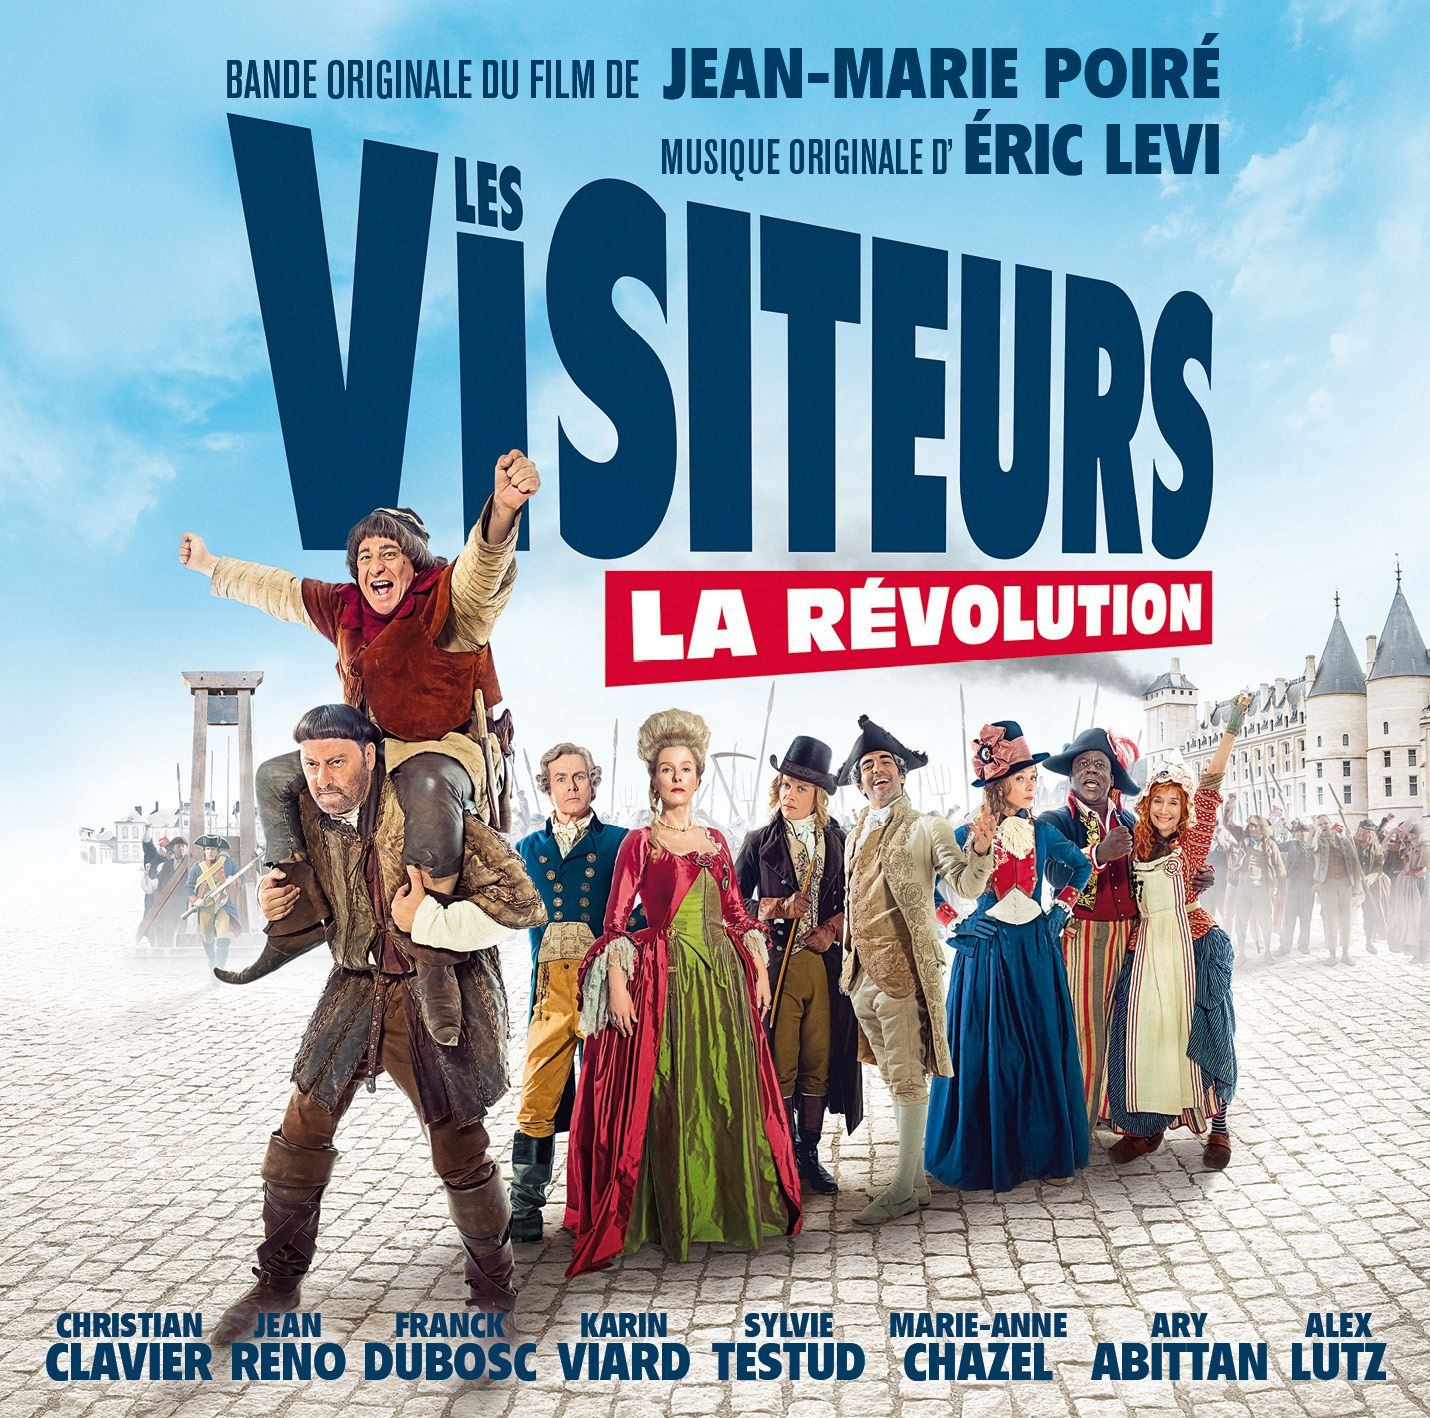 Les Visiteurs La Revolution Soundtrack Eric Levi Jean Reno Bastille Film